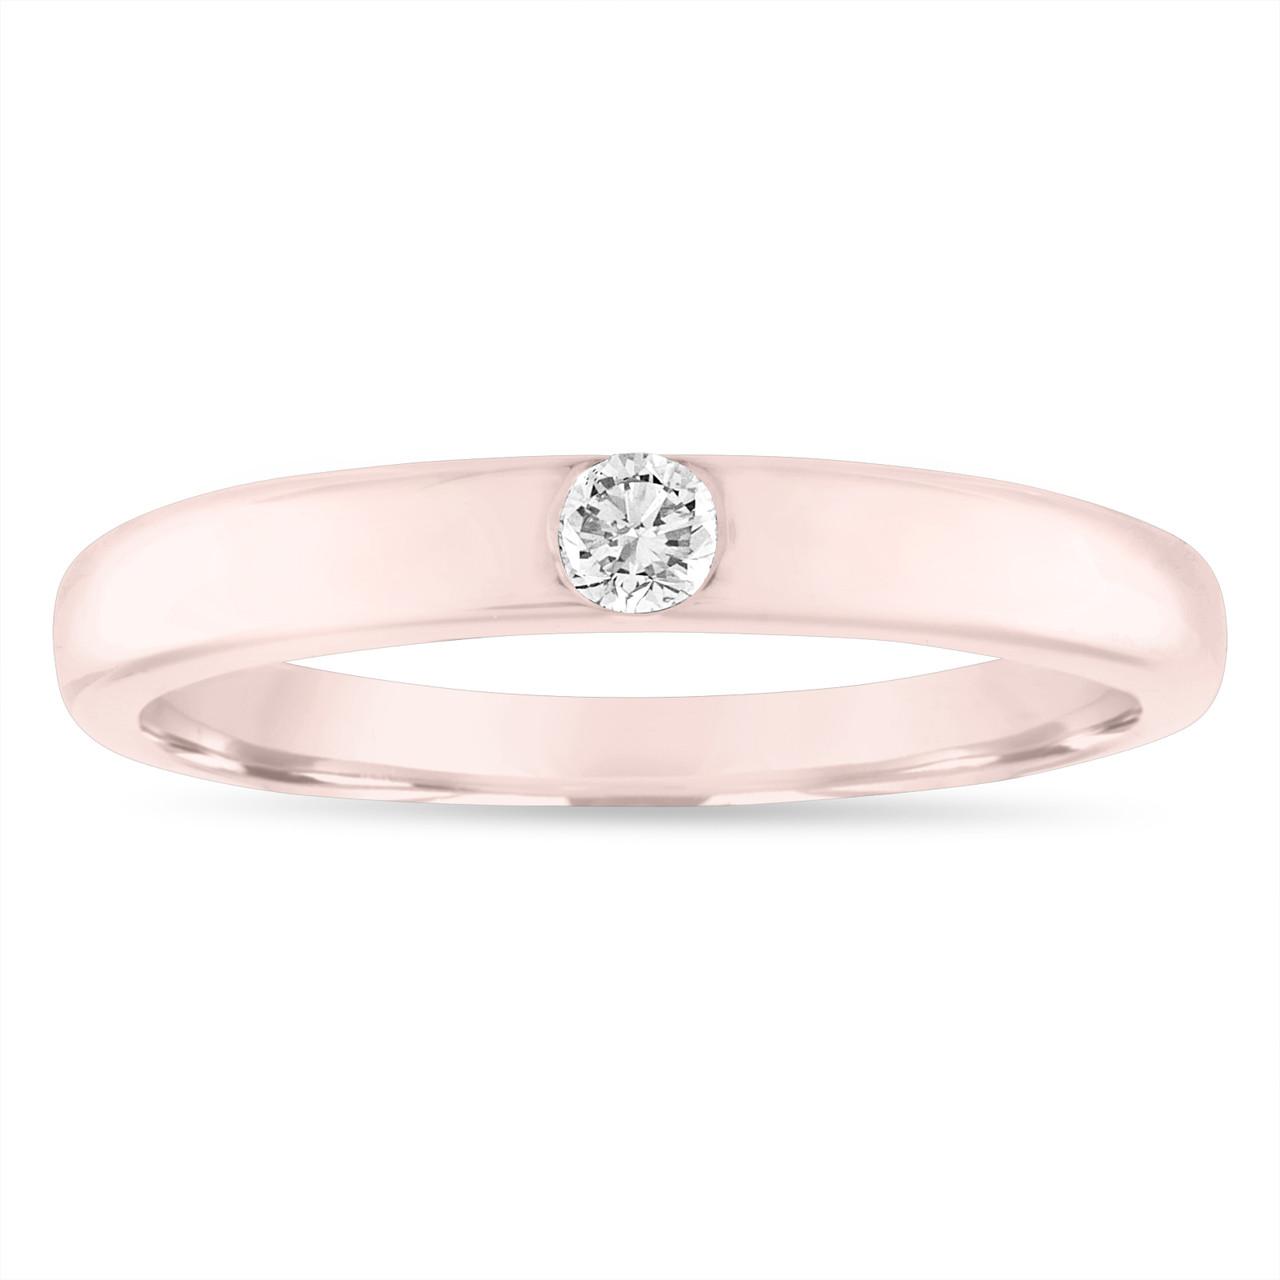 Why You Should Buy From Garo Celik: Gar Diamond Wedding Rings Women At Websimilar.org